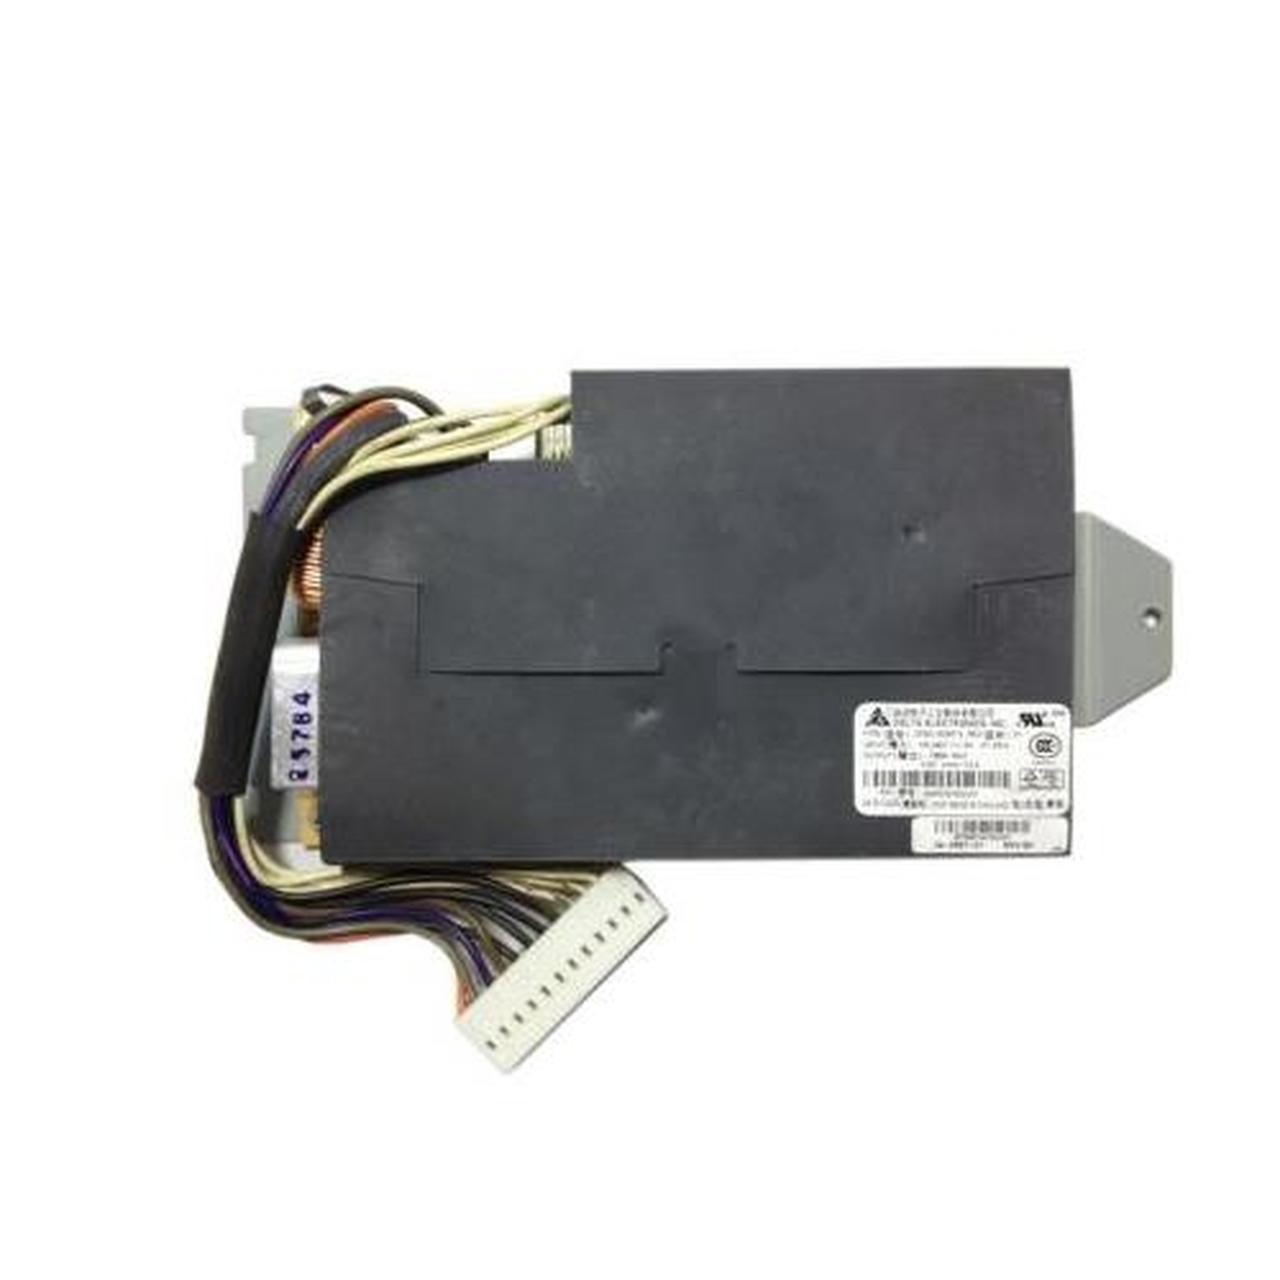 Power Supply (34-0967-01) For Cisco Ws-C3550-48-Emi Switch Plc Mo